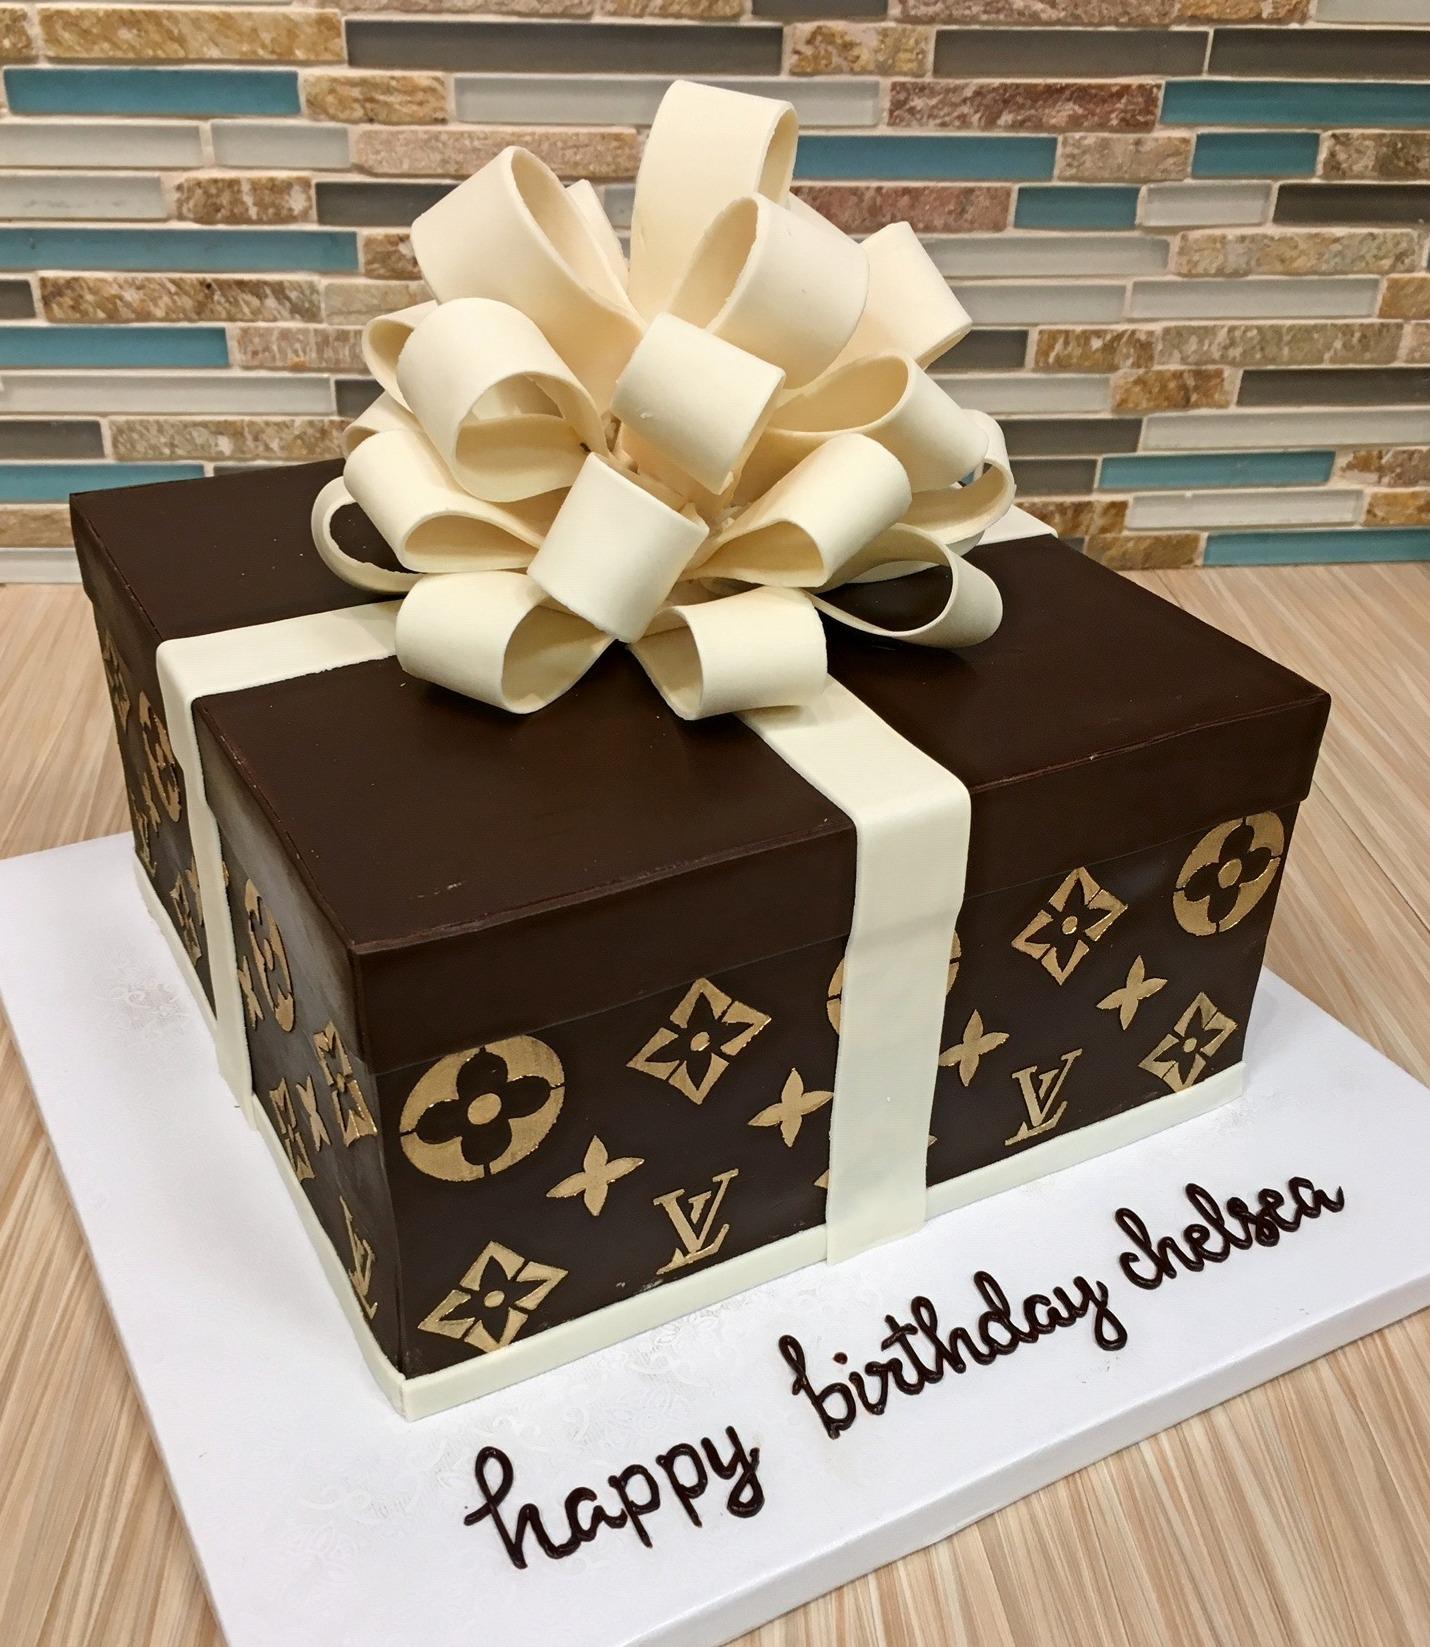 LV Gift Box Cake